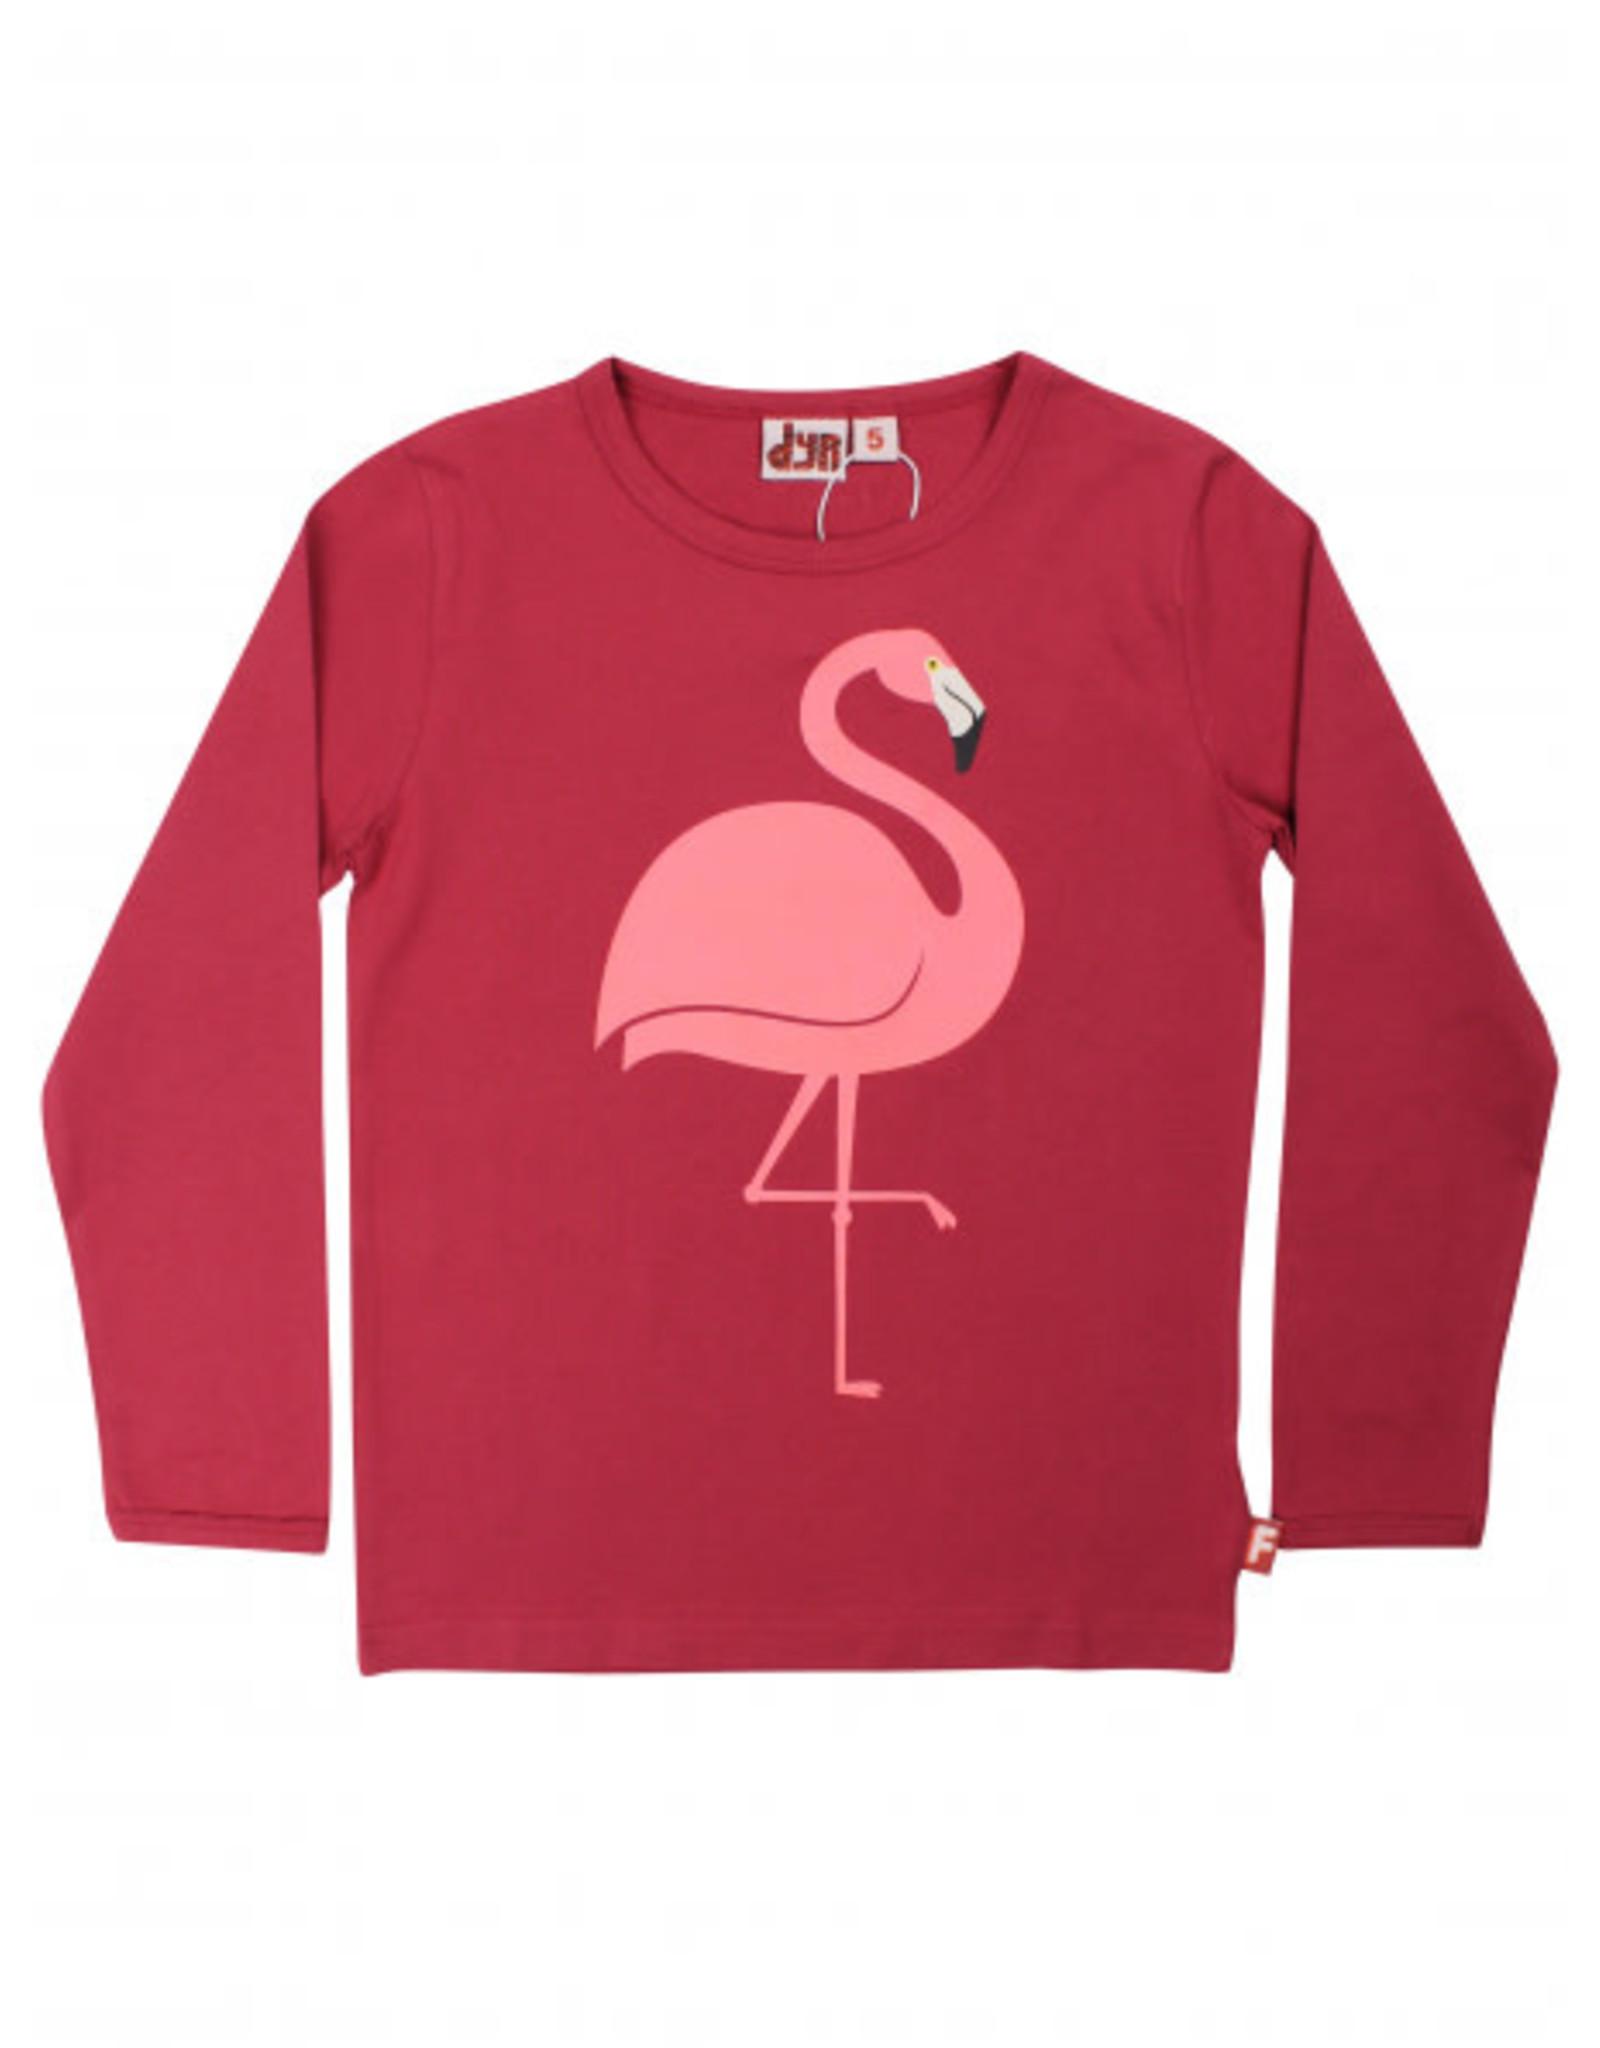 Dyr Roze t-shirt met flamingo